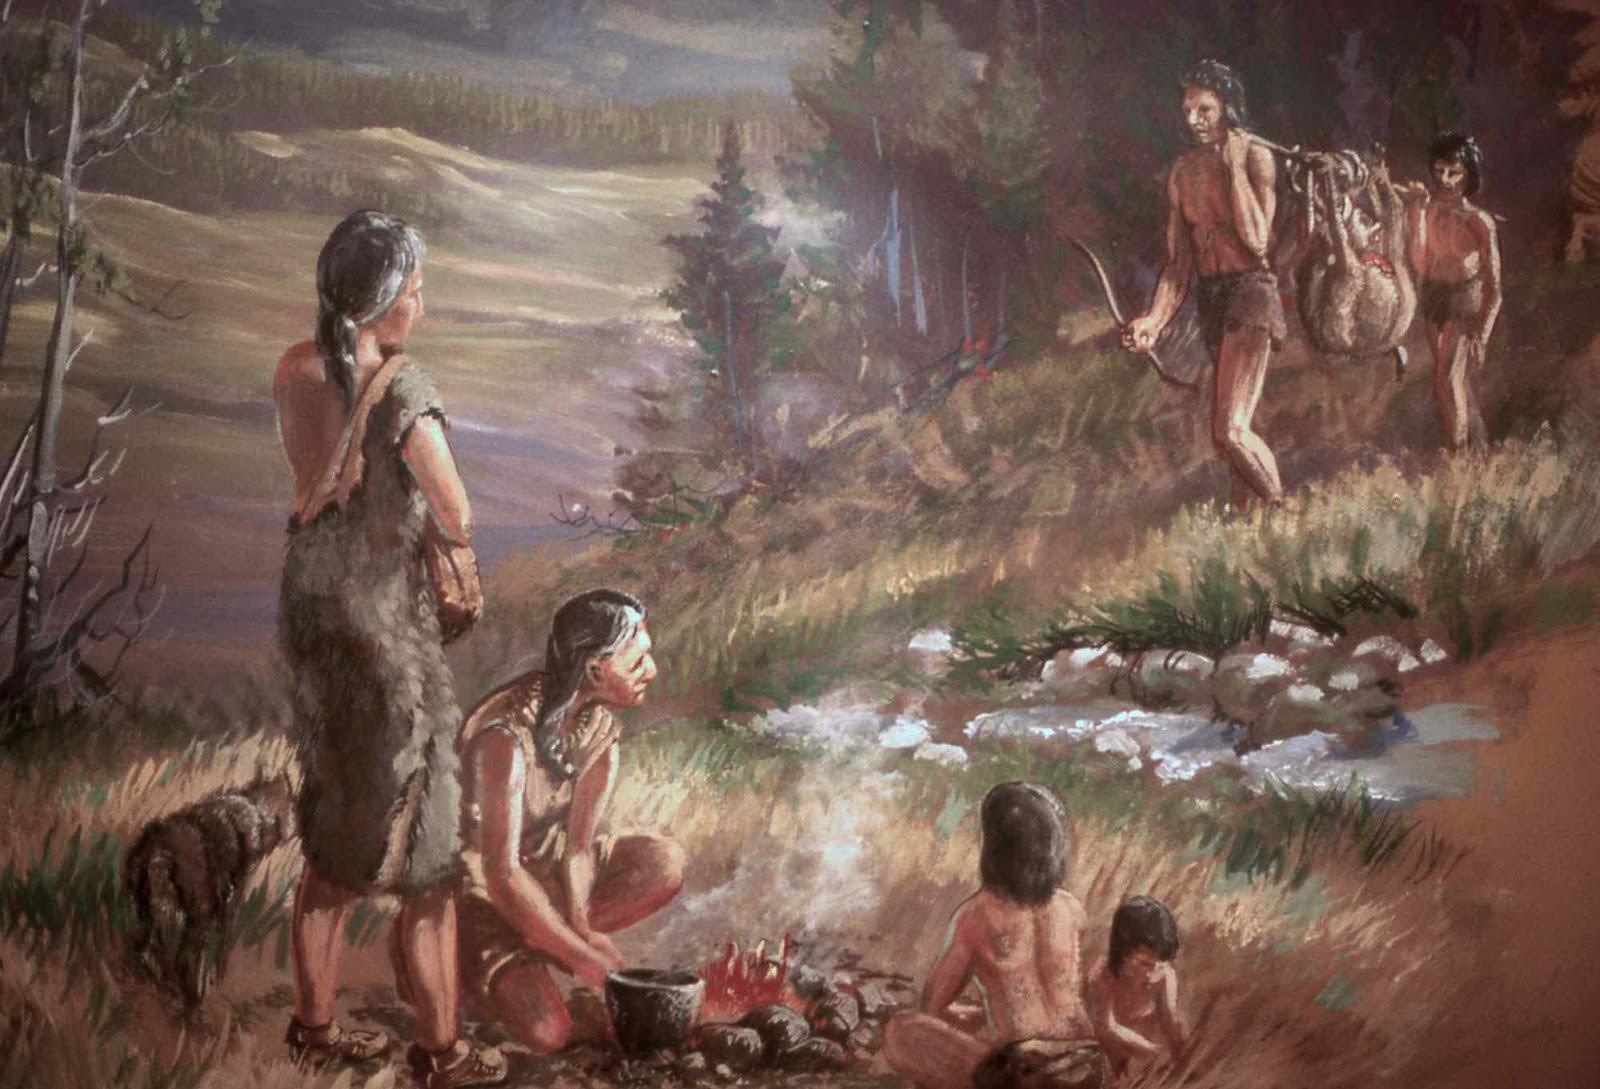 Early Human Santali History